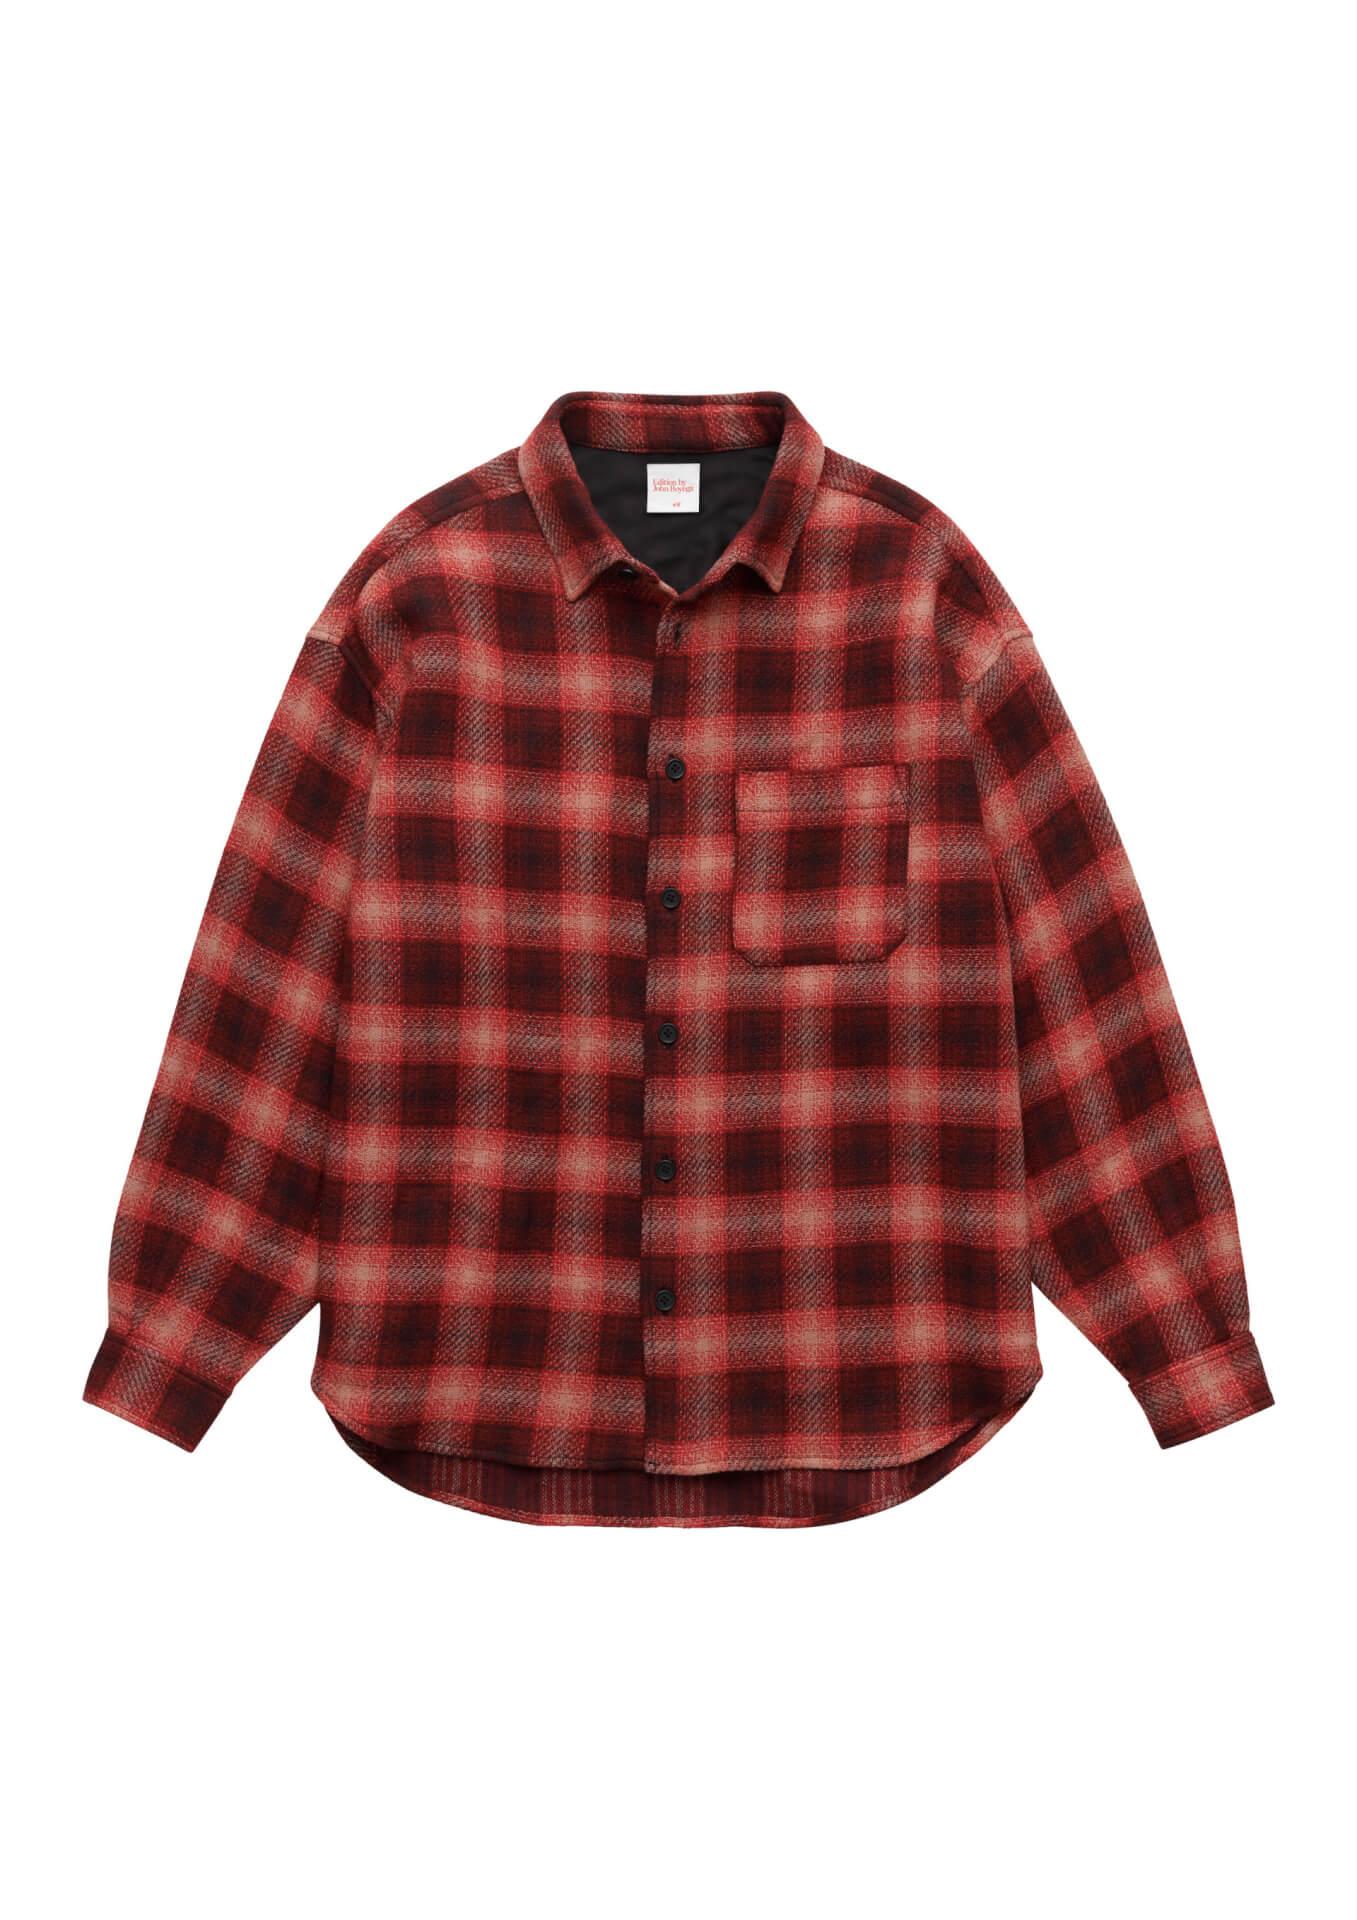 H&Mが俳優のジョン・ボイエガとタッグを組んだメンズウェアコレクションを発表!リサイクル素材、オーガニック素材を使用したアイテムが登場 life211006_handm_john_boyega_08